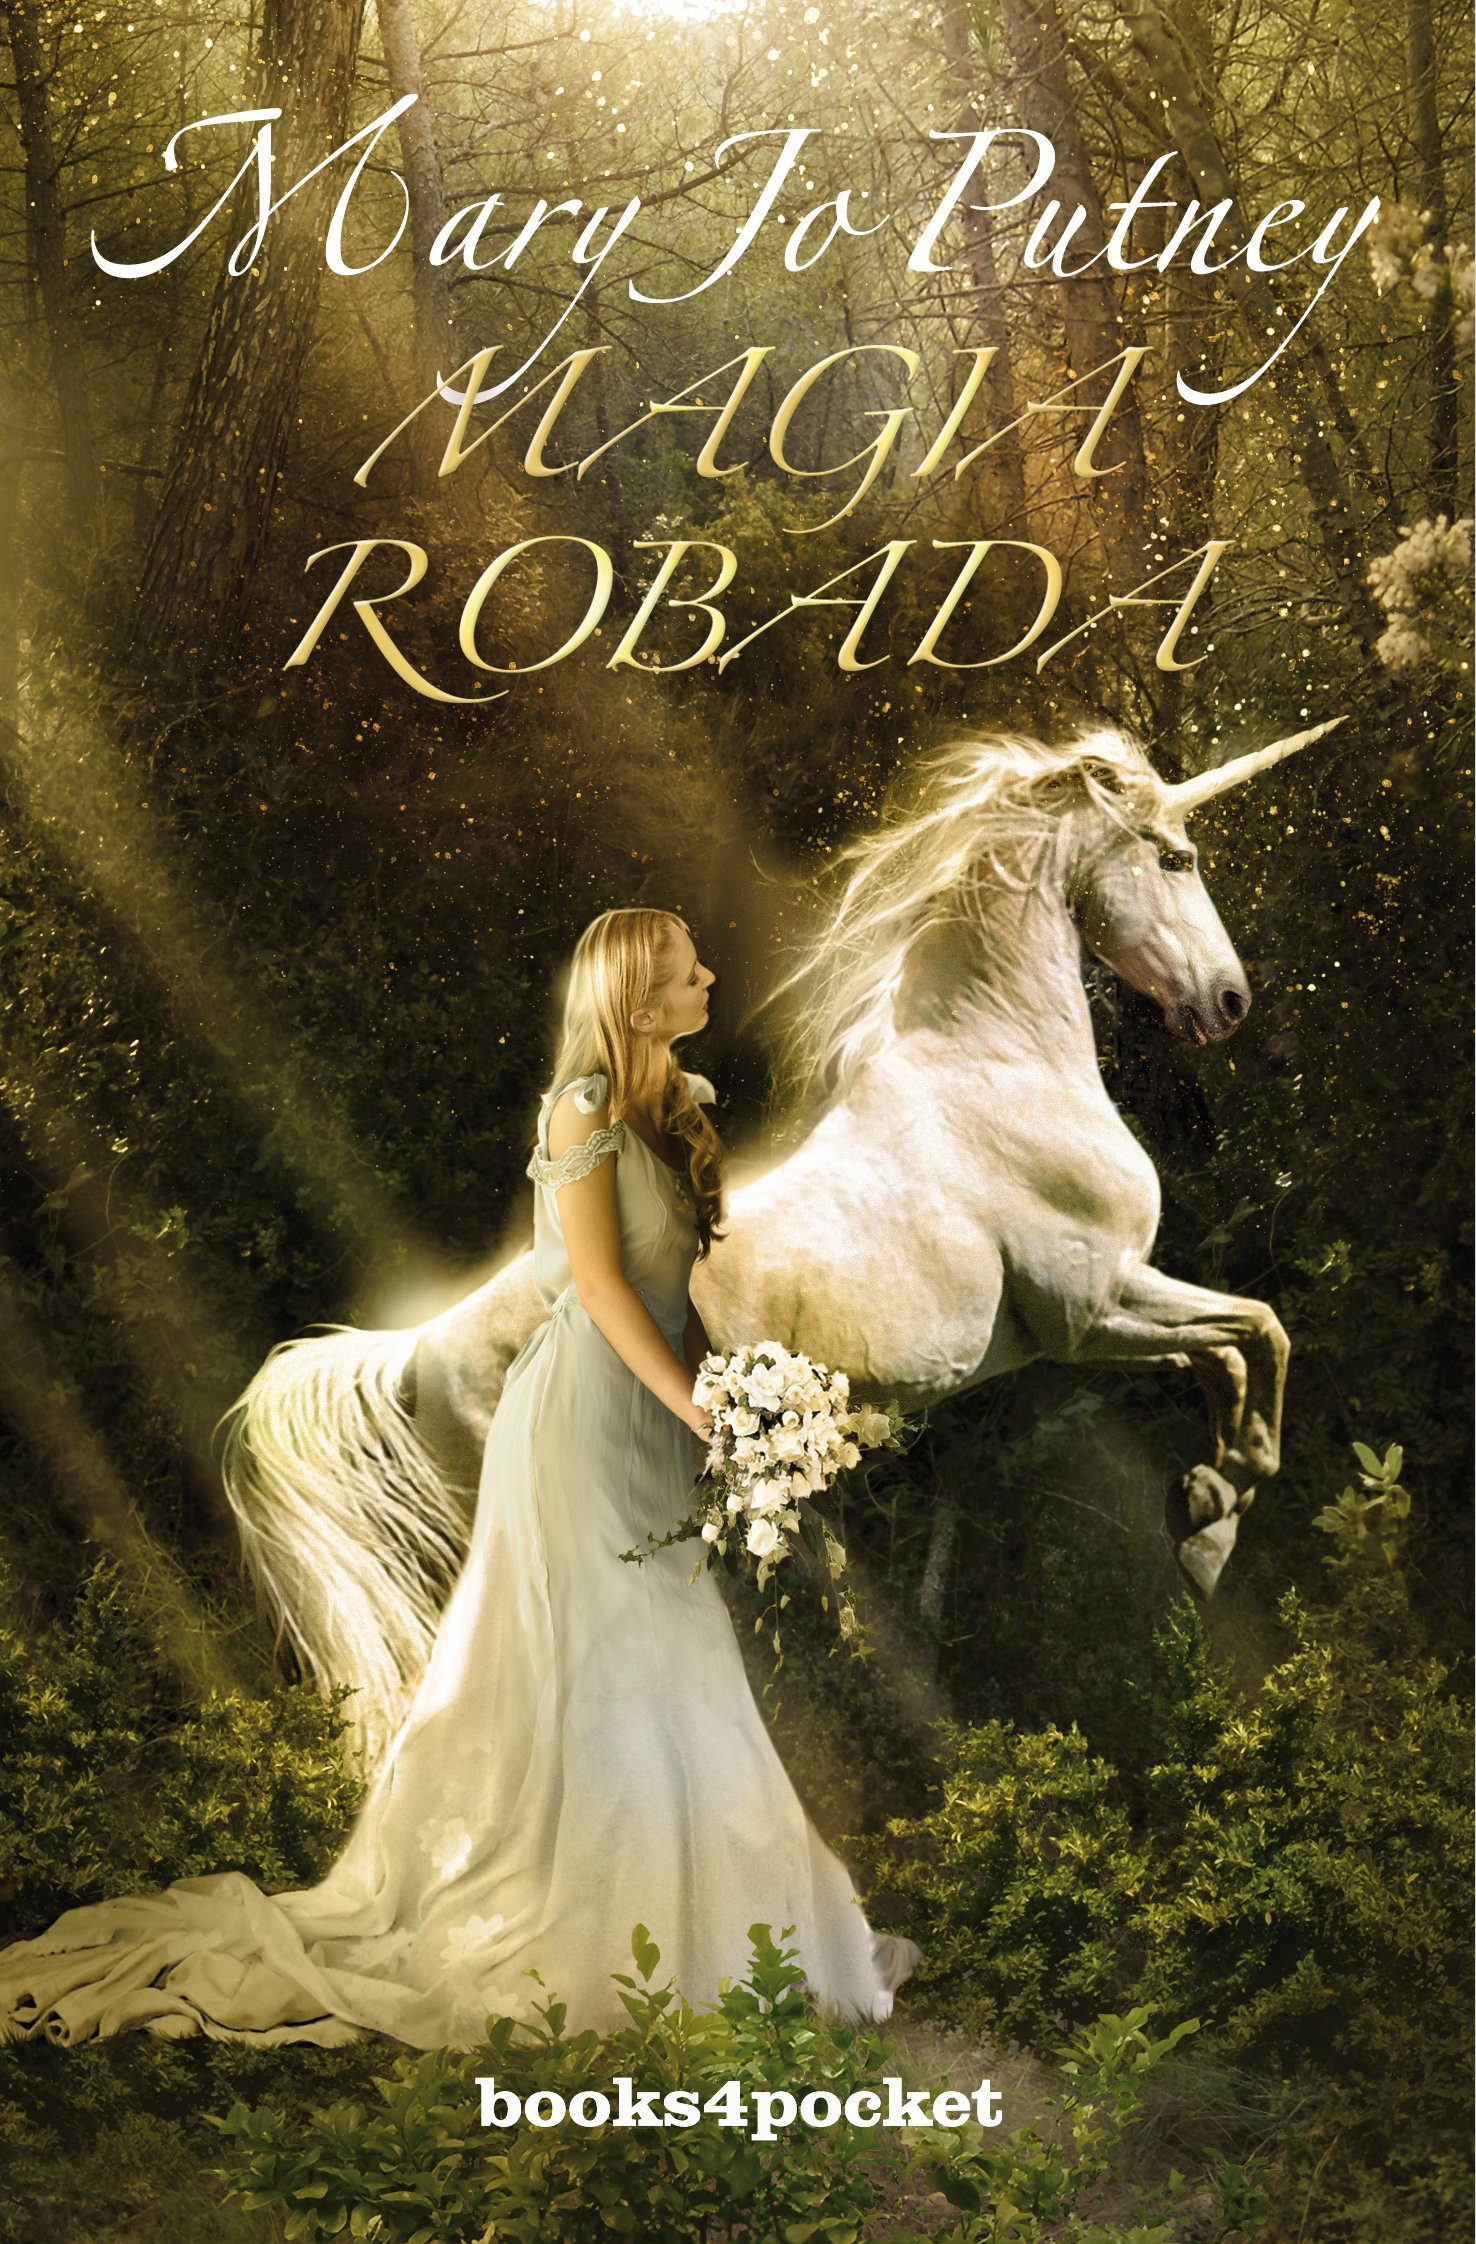 Magia robada (Books4pocket romántica): Amazon.es: Mary Jo Putney, Mireia Terés Loriente: Libros